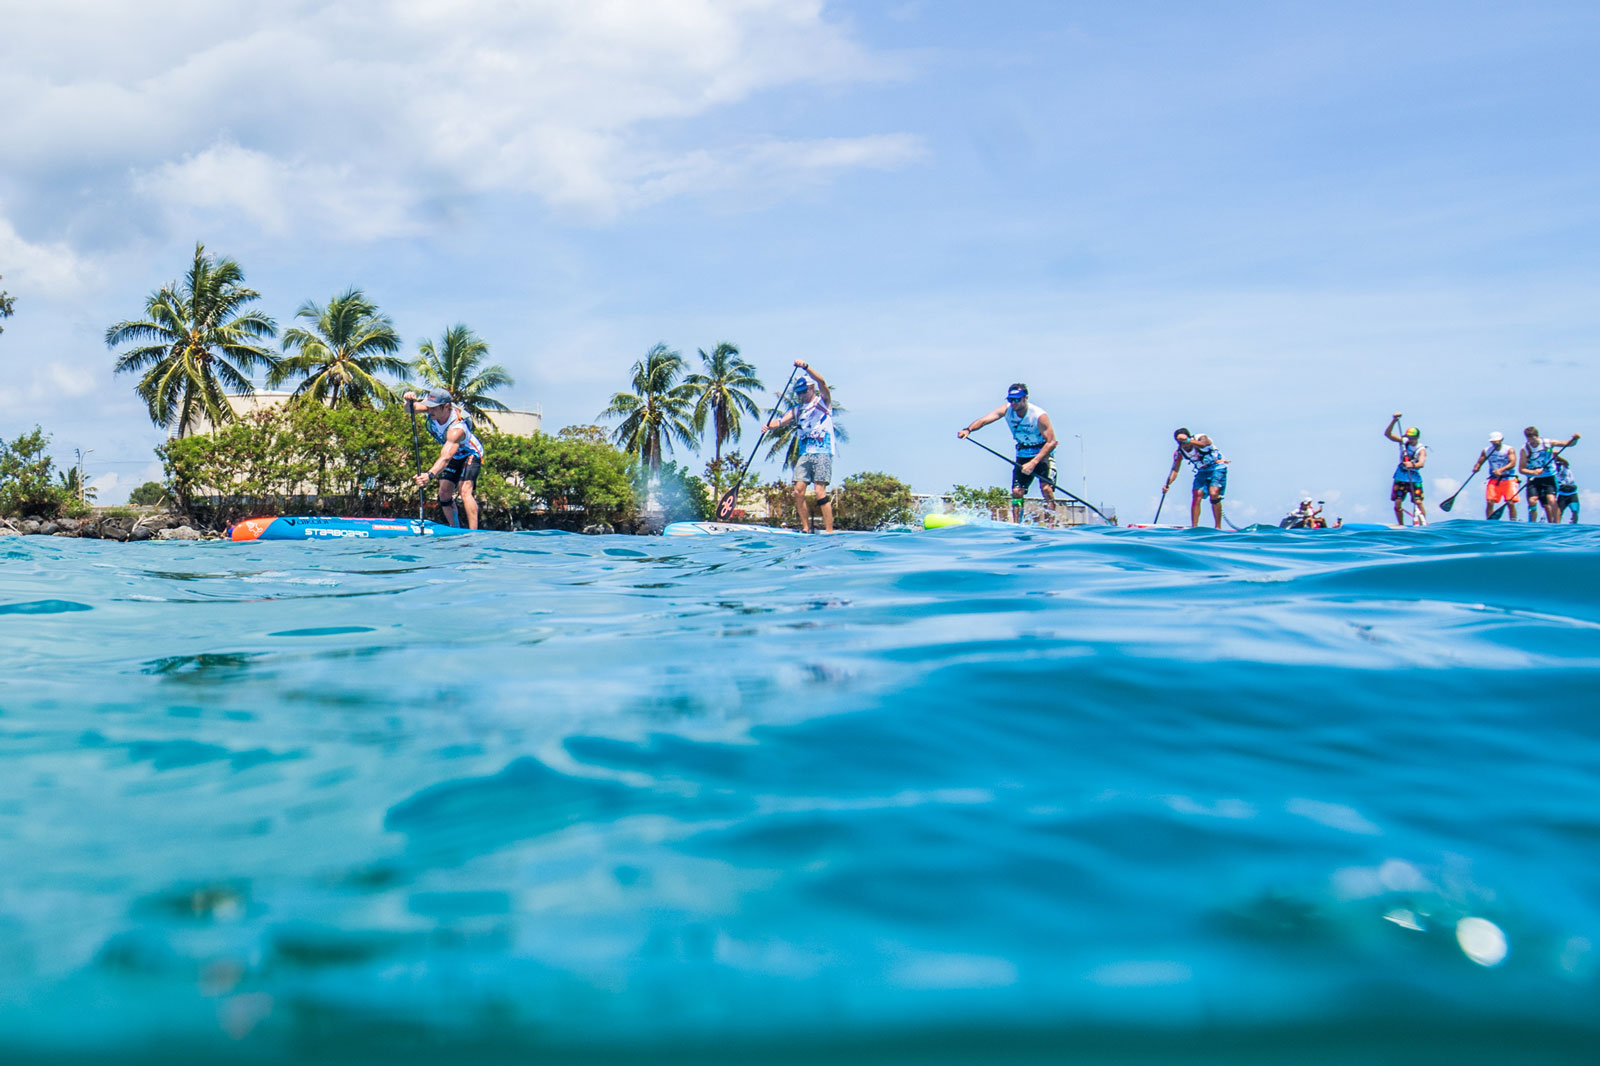 Air-France-Paddle-Festival-2018-Tahiti-Michael-Booth-Australia-2-photo-credit-Georgia-Schoefield.jpg